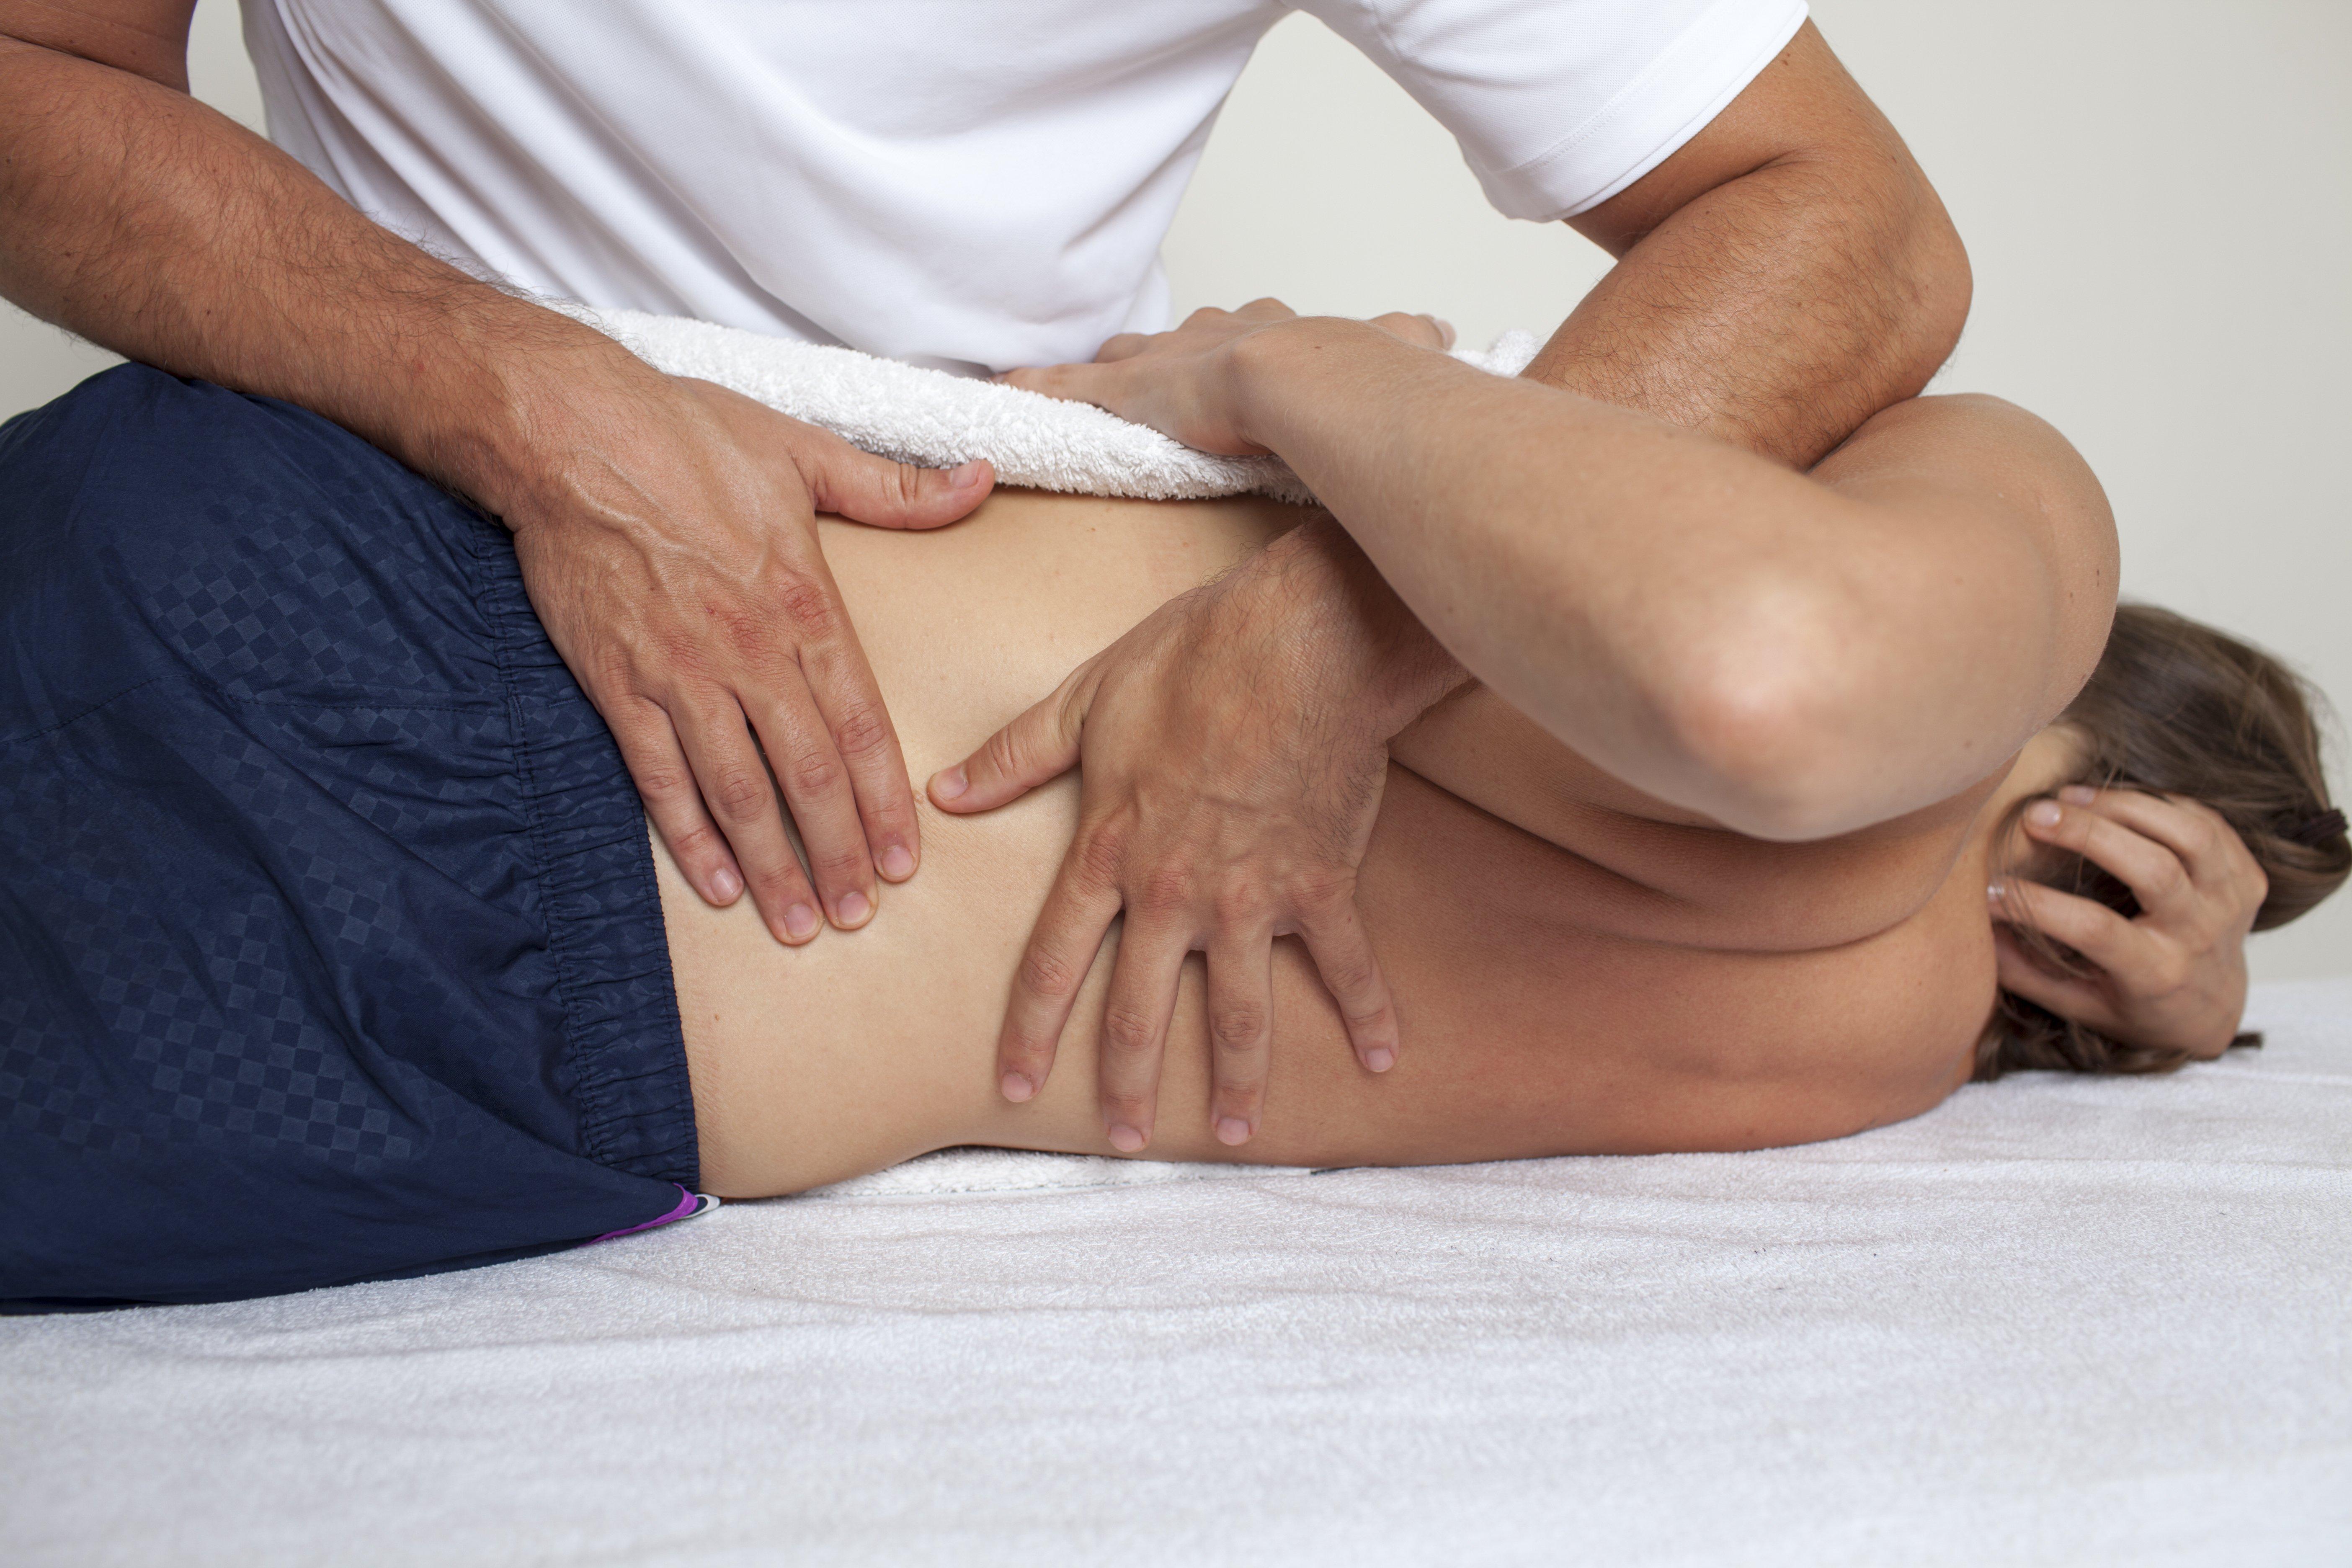 pregnancy woman massage therapist relaxation